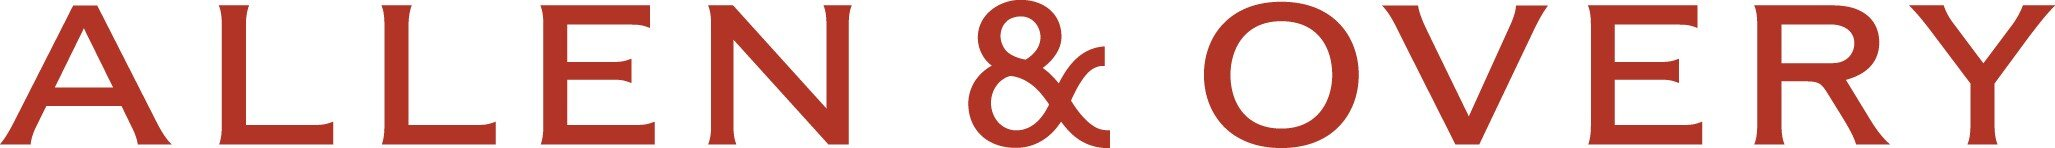 AO_Logo_Red_RGB_jpg.jpg